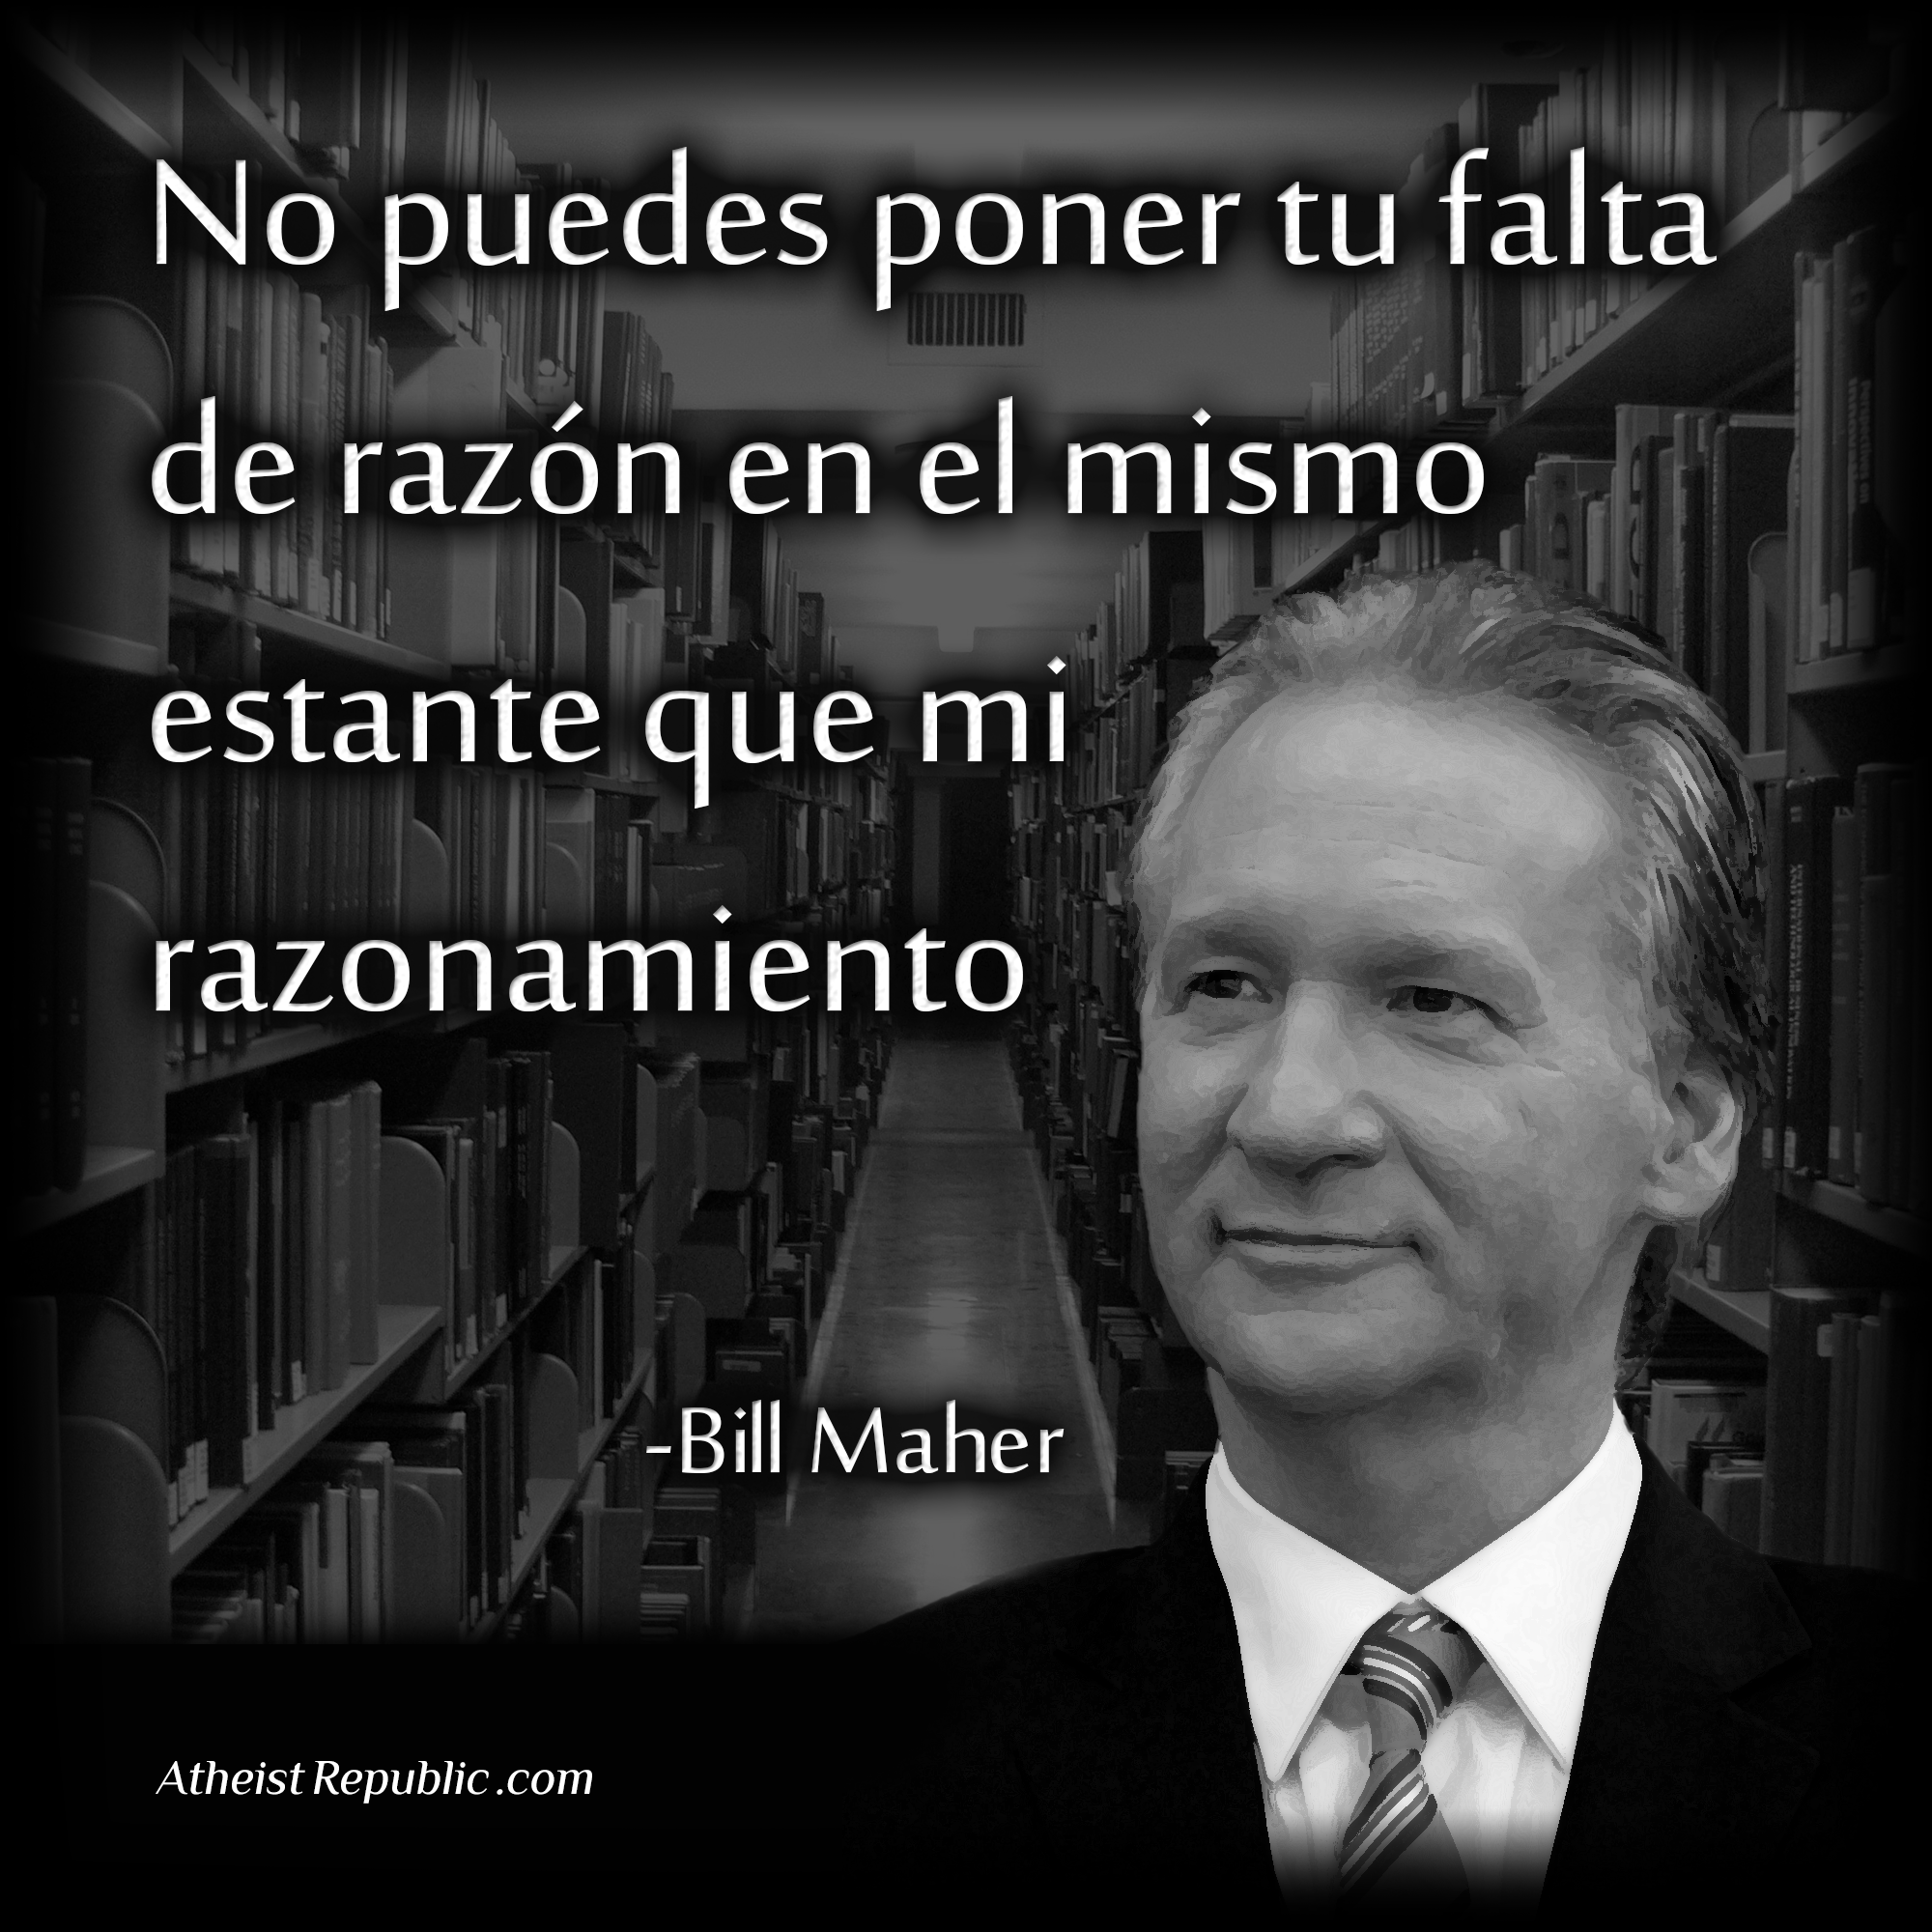 Reason - Bill Maher